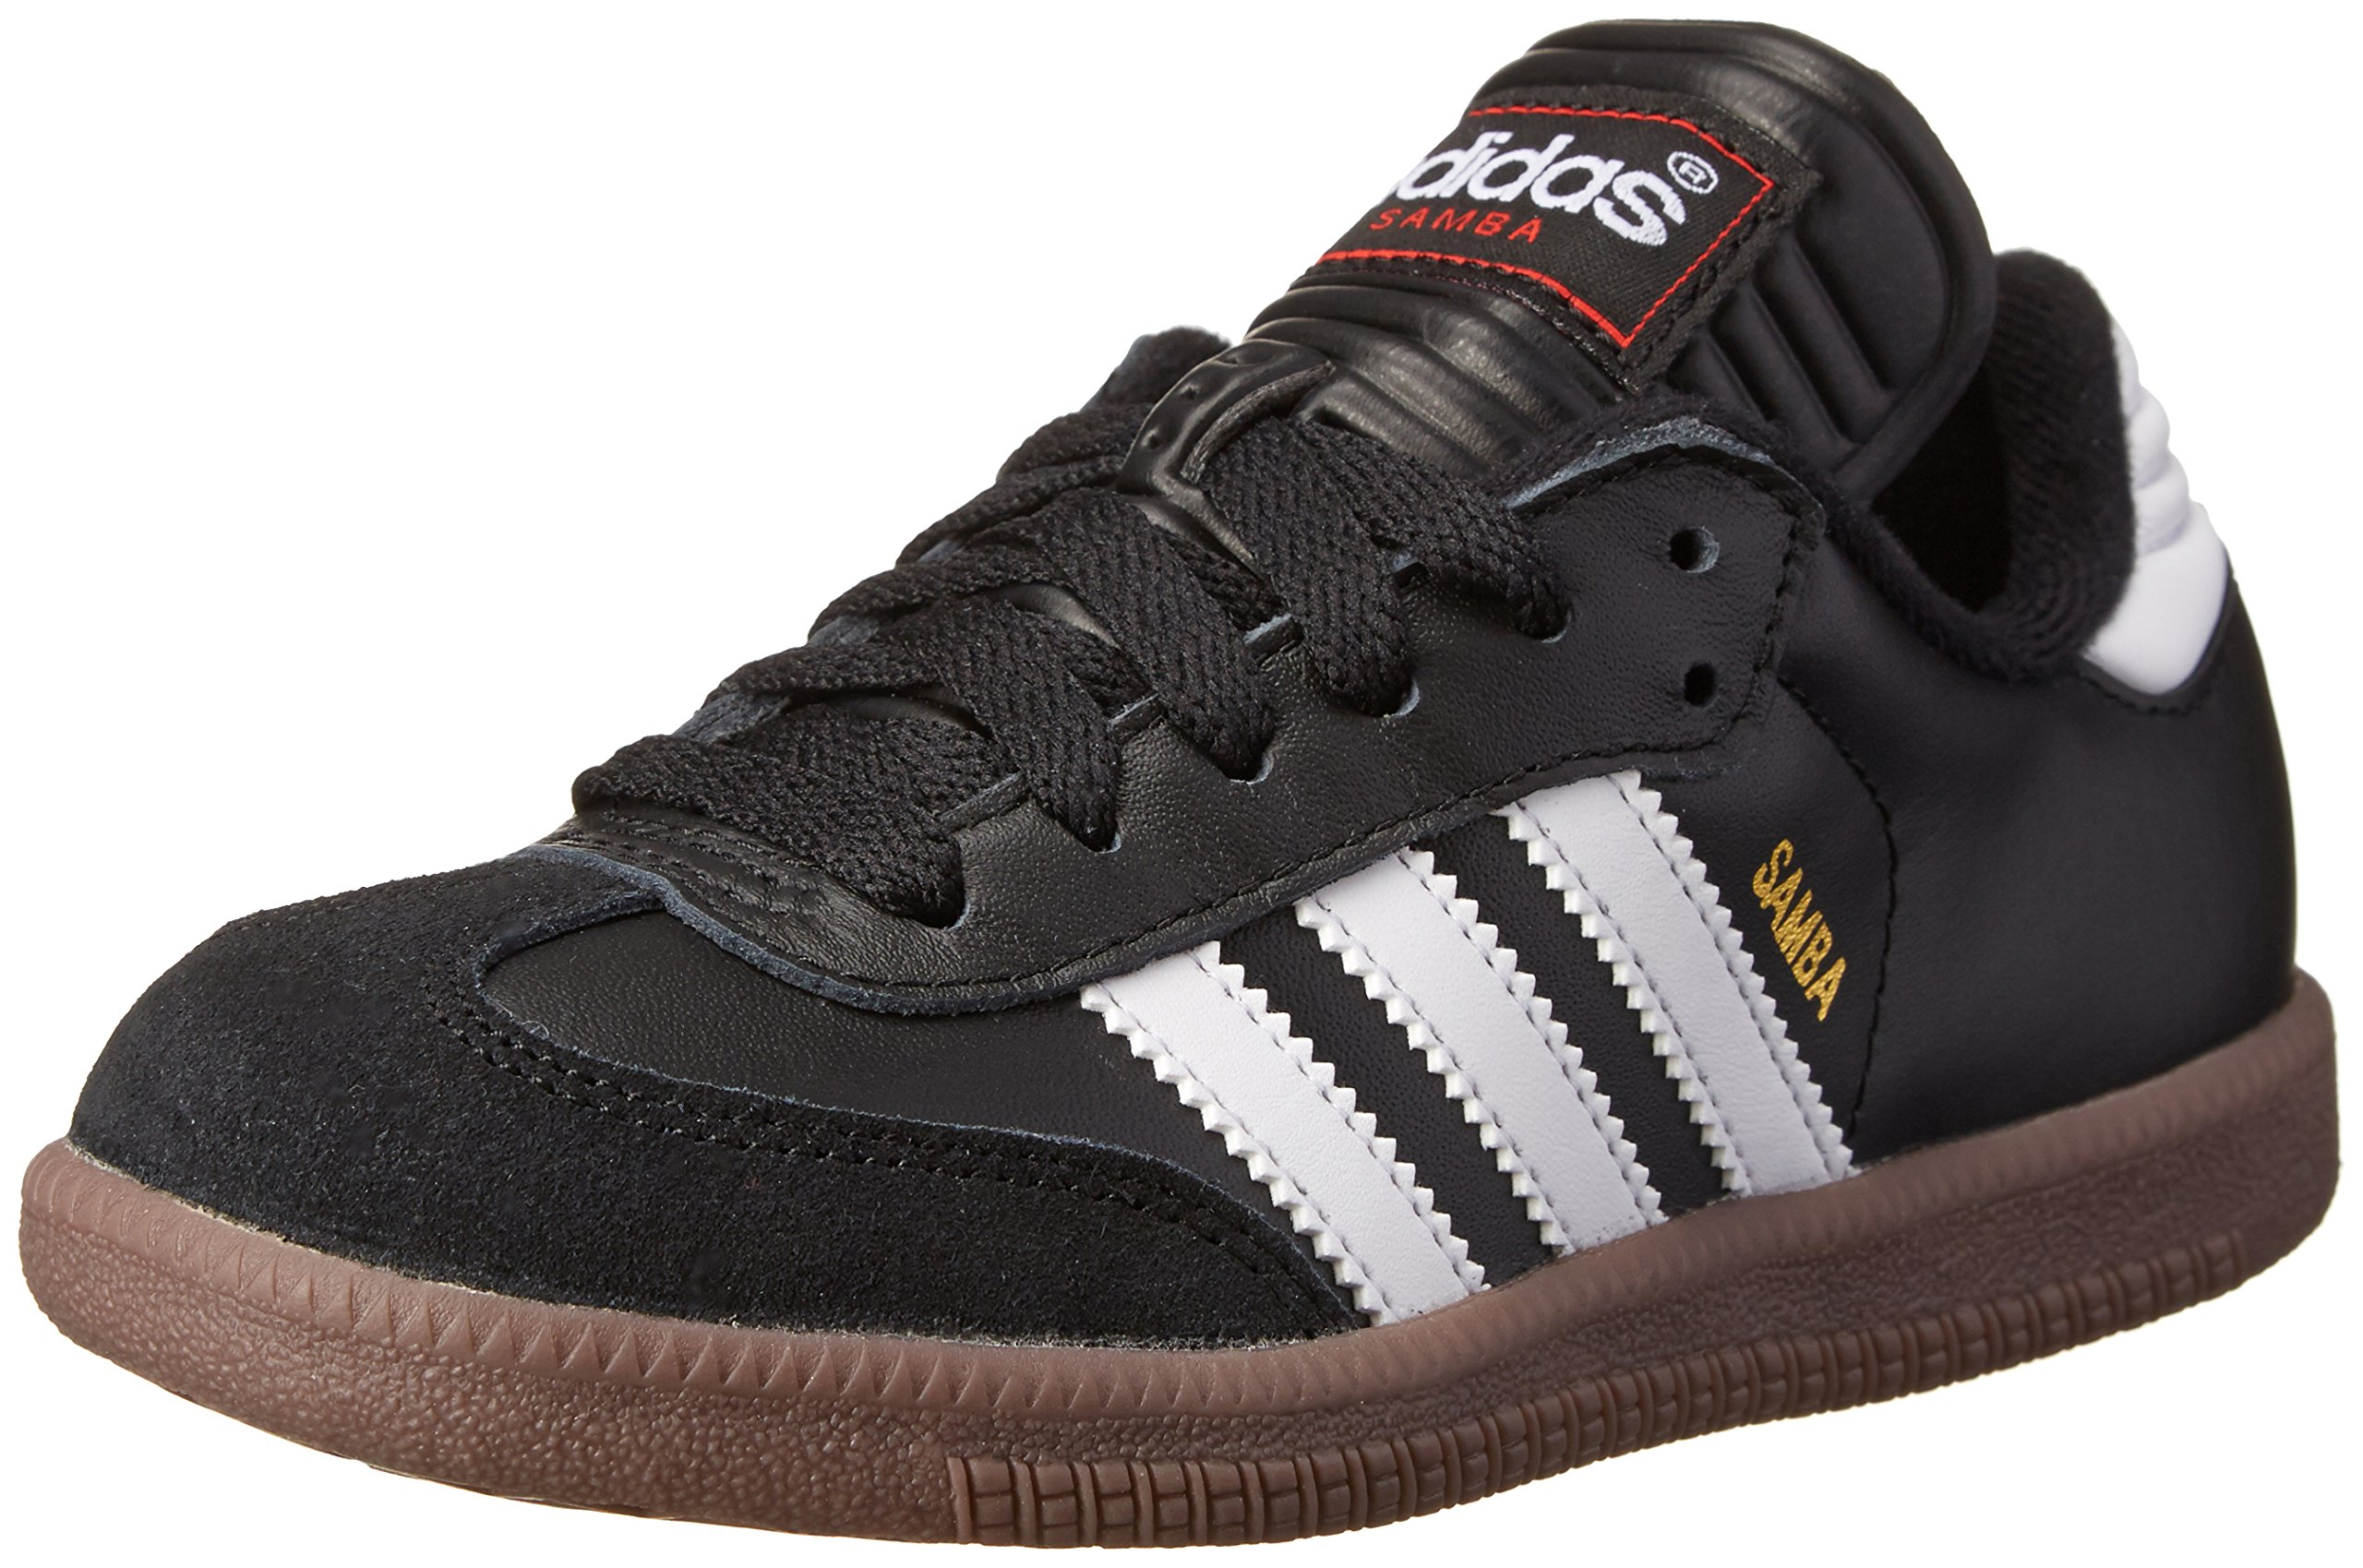 adidas Performance Kid's Samba Classic Athletic Shoe, schwarz/white, 11K M US Little Kid by adidas